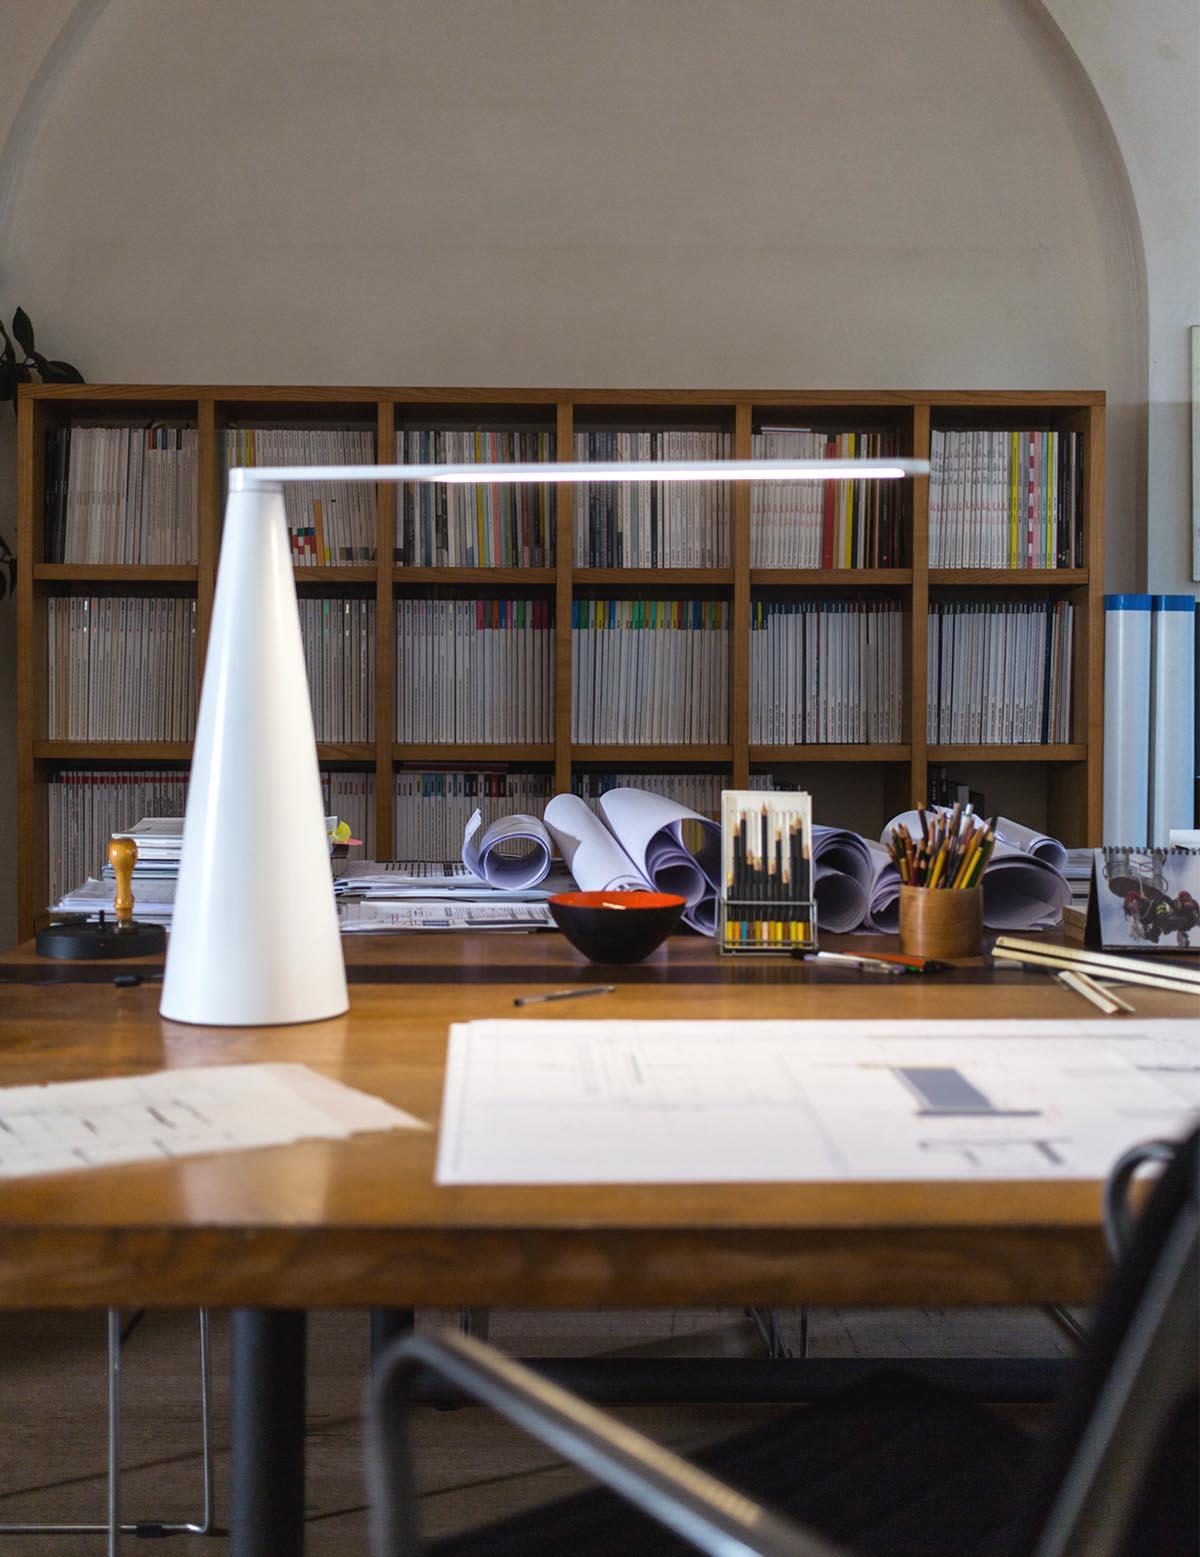 Lampada Elica, design di Brian Sironi per Martinelli Luce